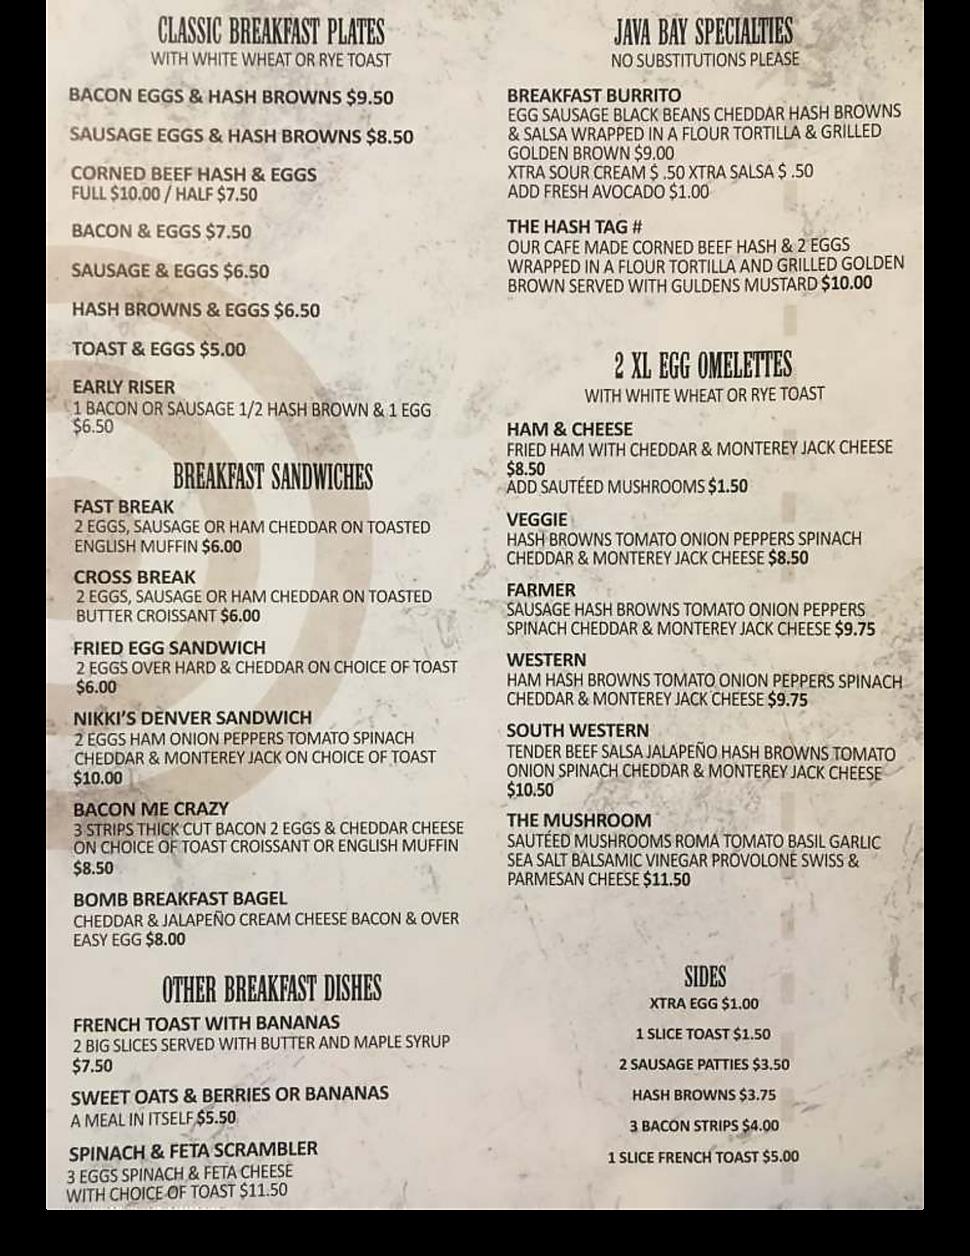 Java Bay restaurant menu breakfast Burrito hours location deals Marquette Now